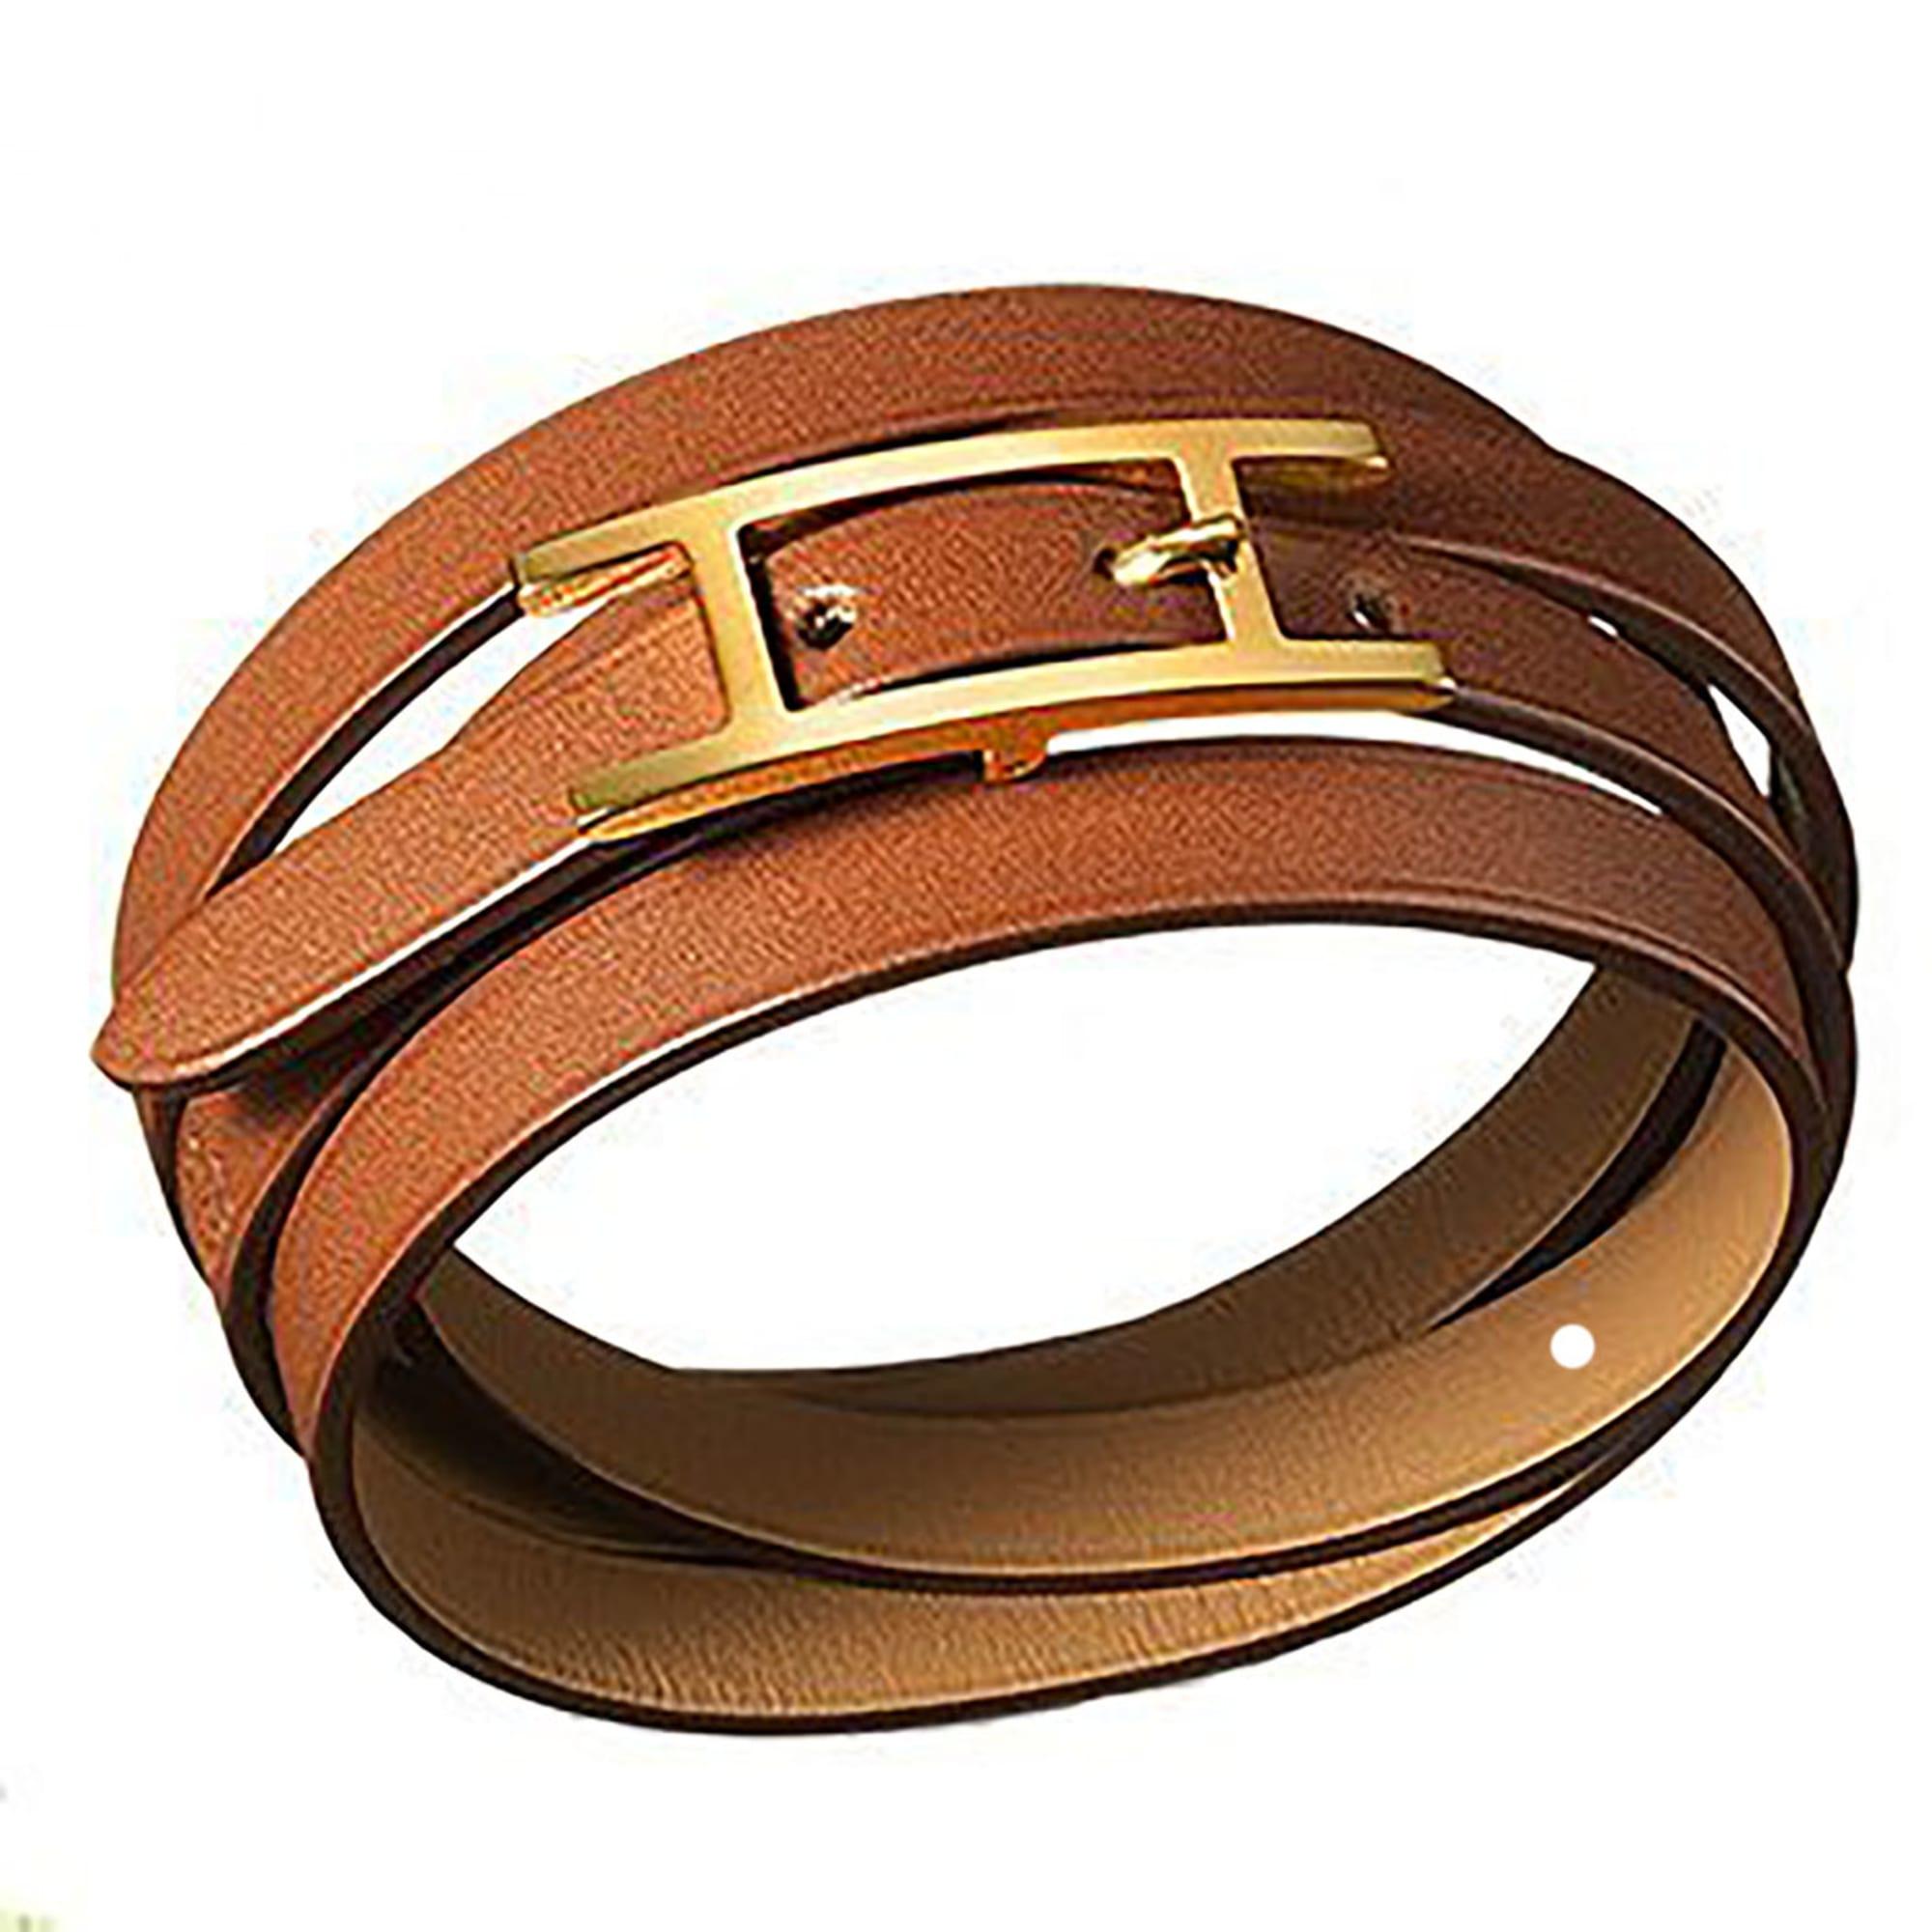 fc20a79b0ee4 Bracelet HERMÈS behapi beige vendu par Gvilla - 7241714